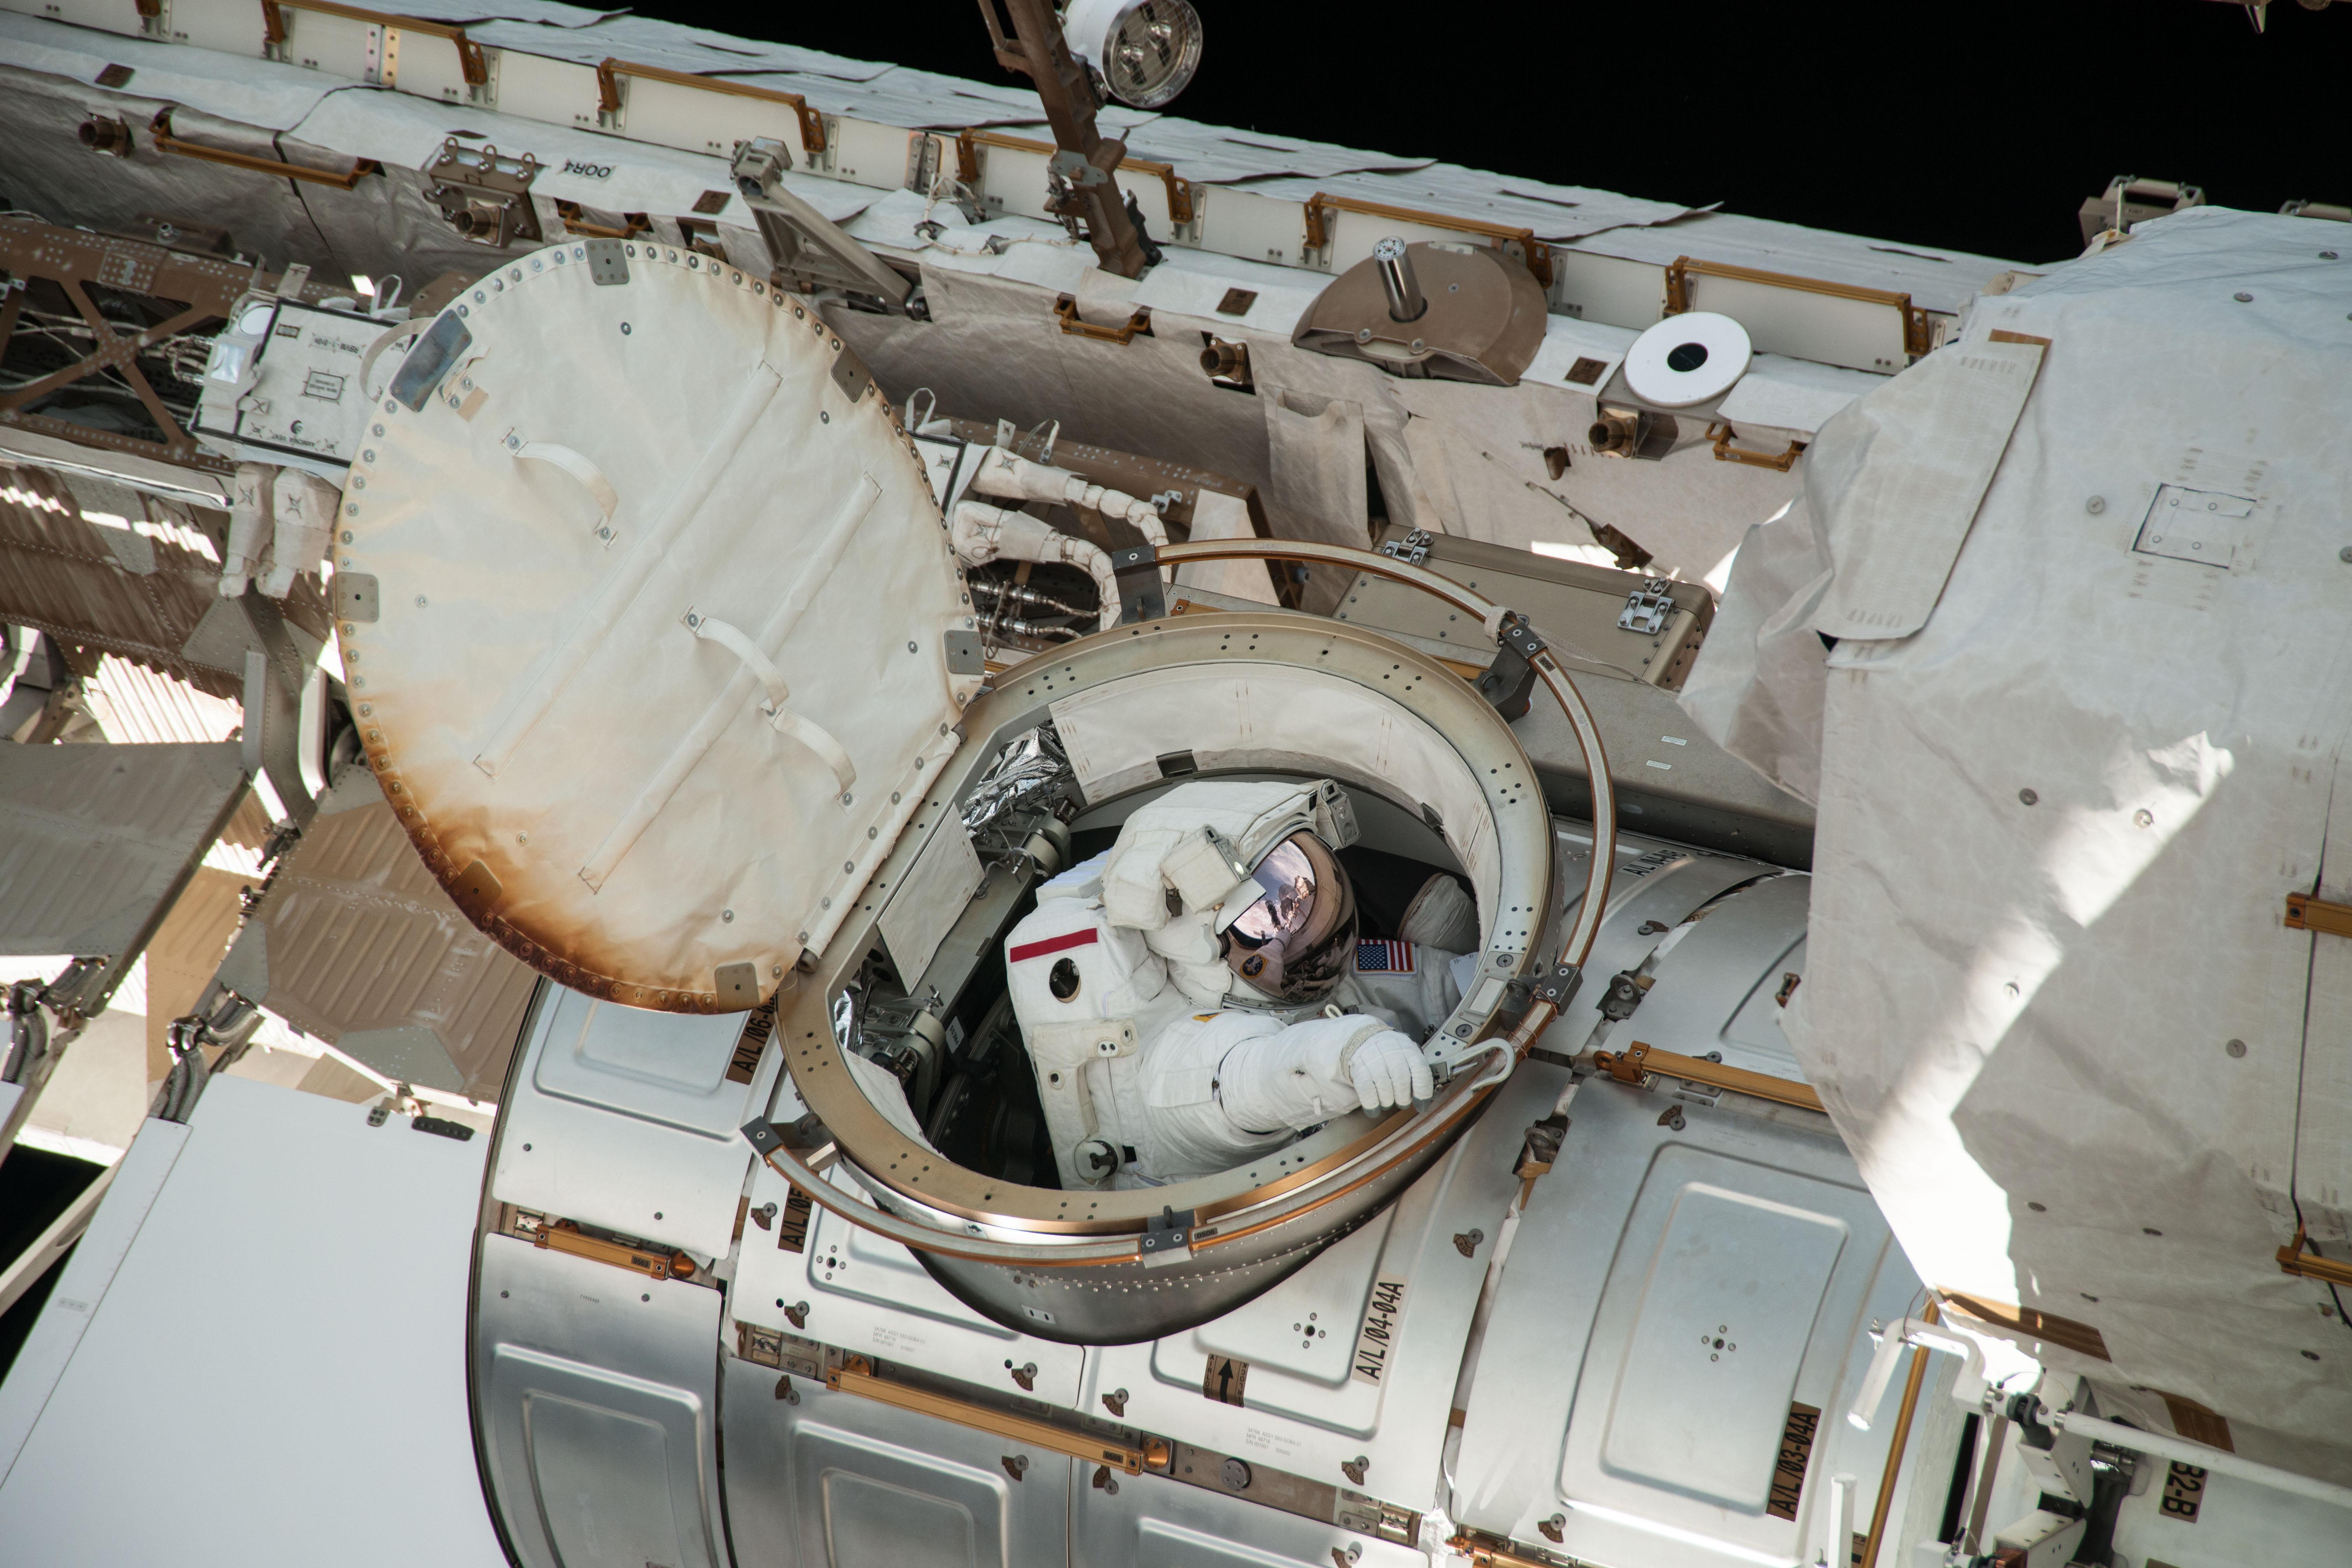 space shuttle b. hatch - photo #27